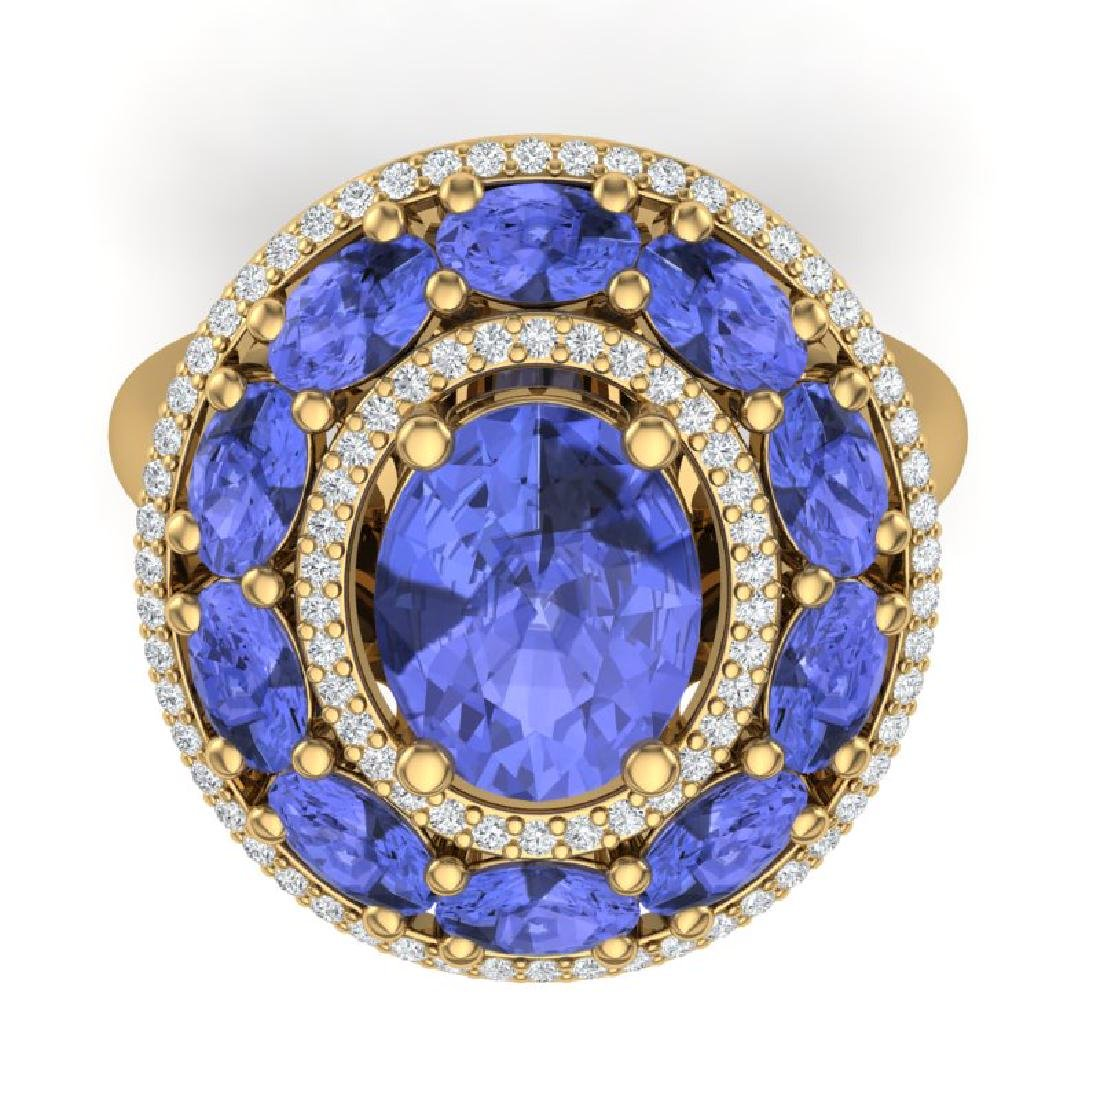 8.49 CTW Royalty Tanzanite & VS Diamond Ring 18K Yellow - 2